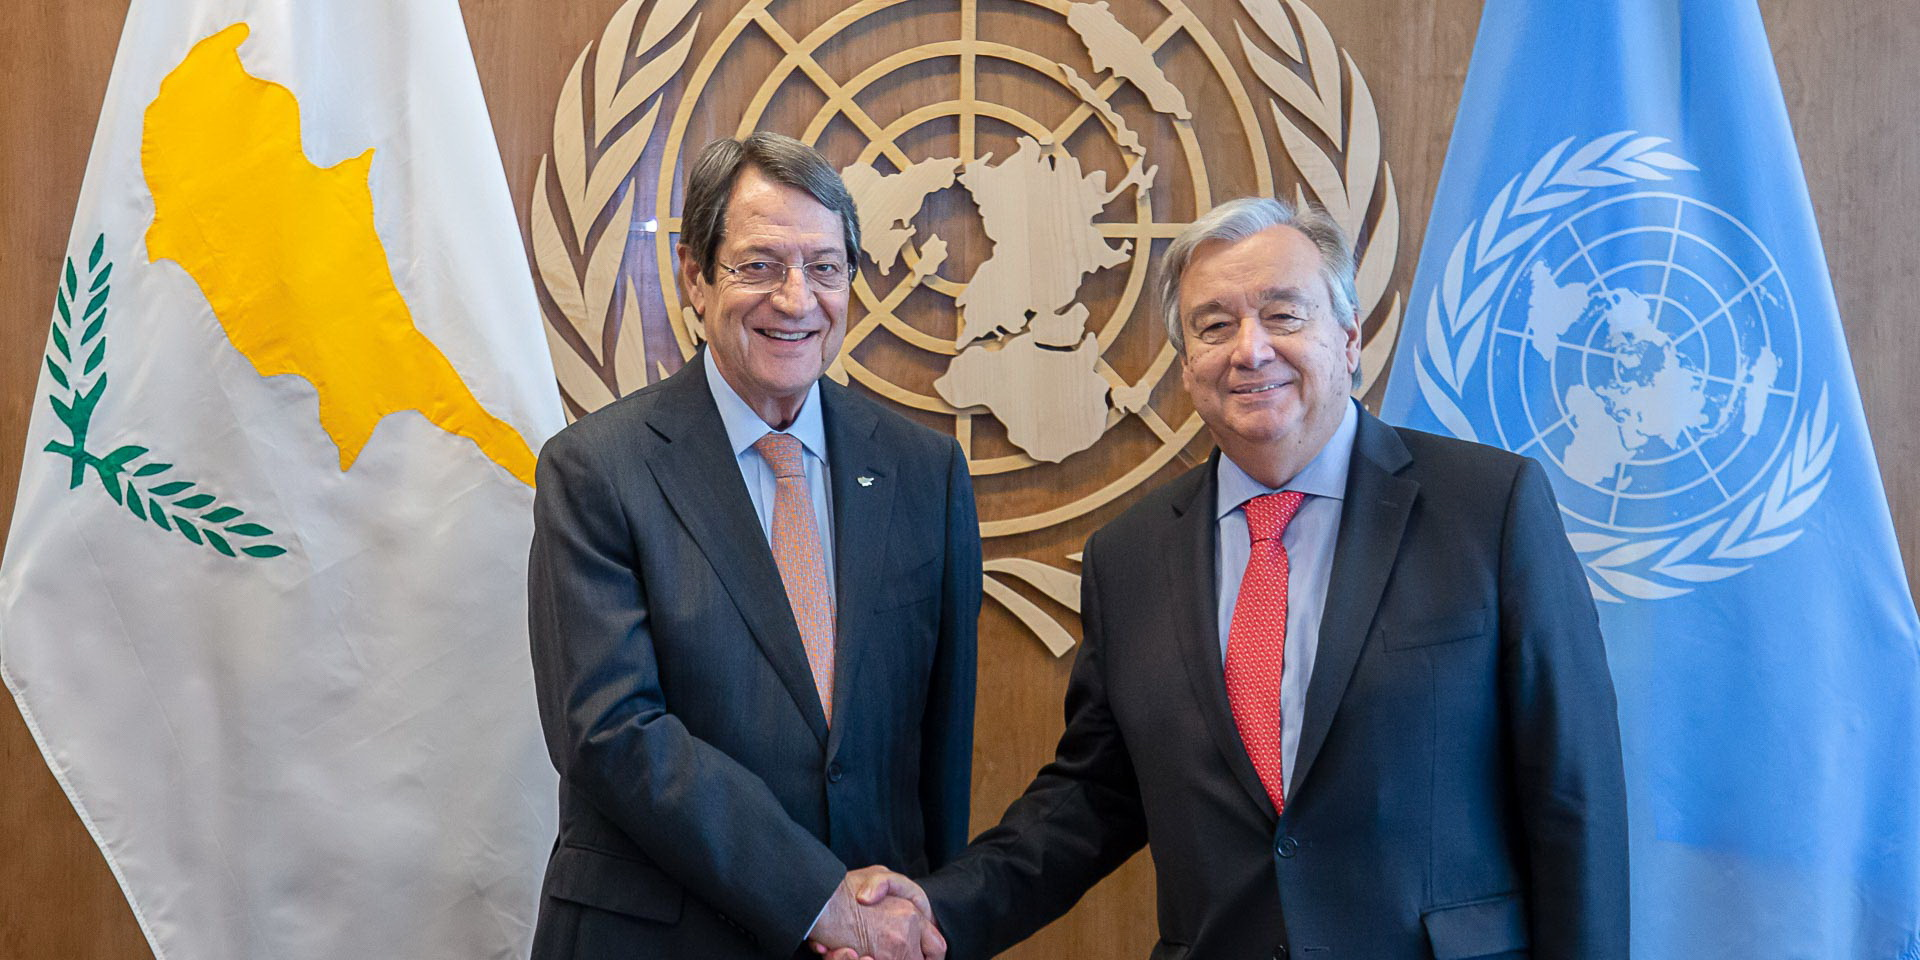 Kipar: Predsednik Anastasiades primio pozivno pismo Generalnog sekretara UN za neformalni sastanak 5+1